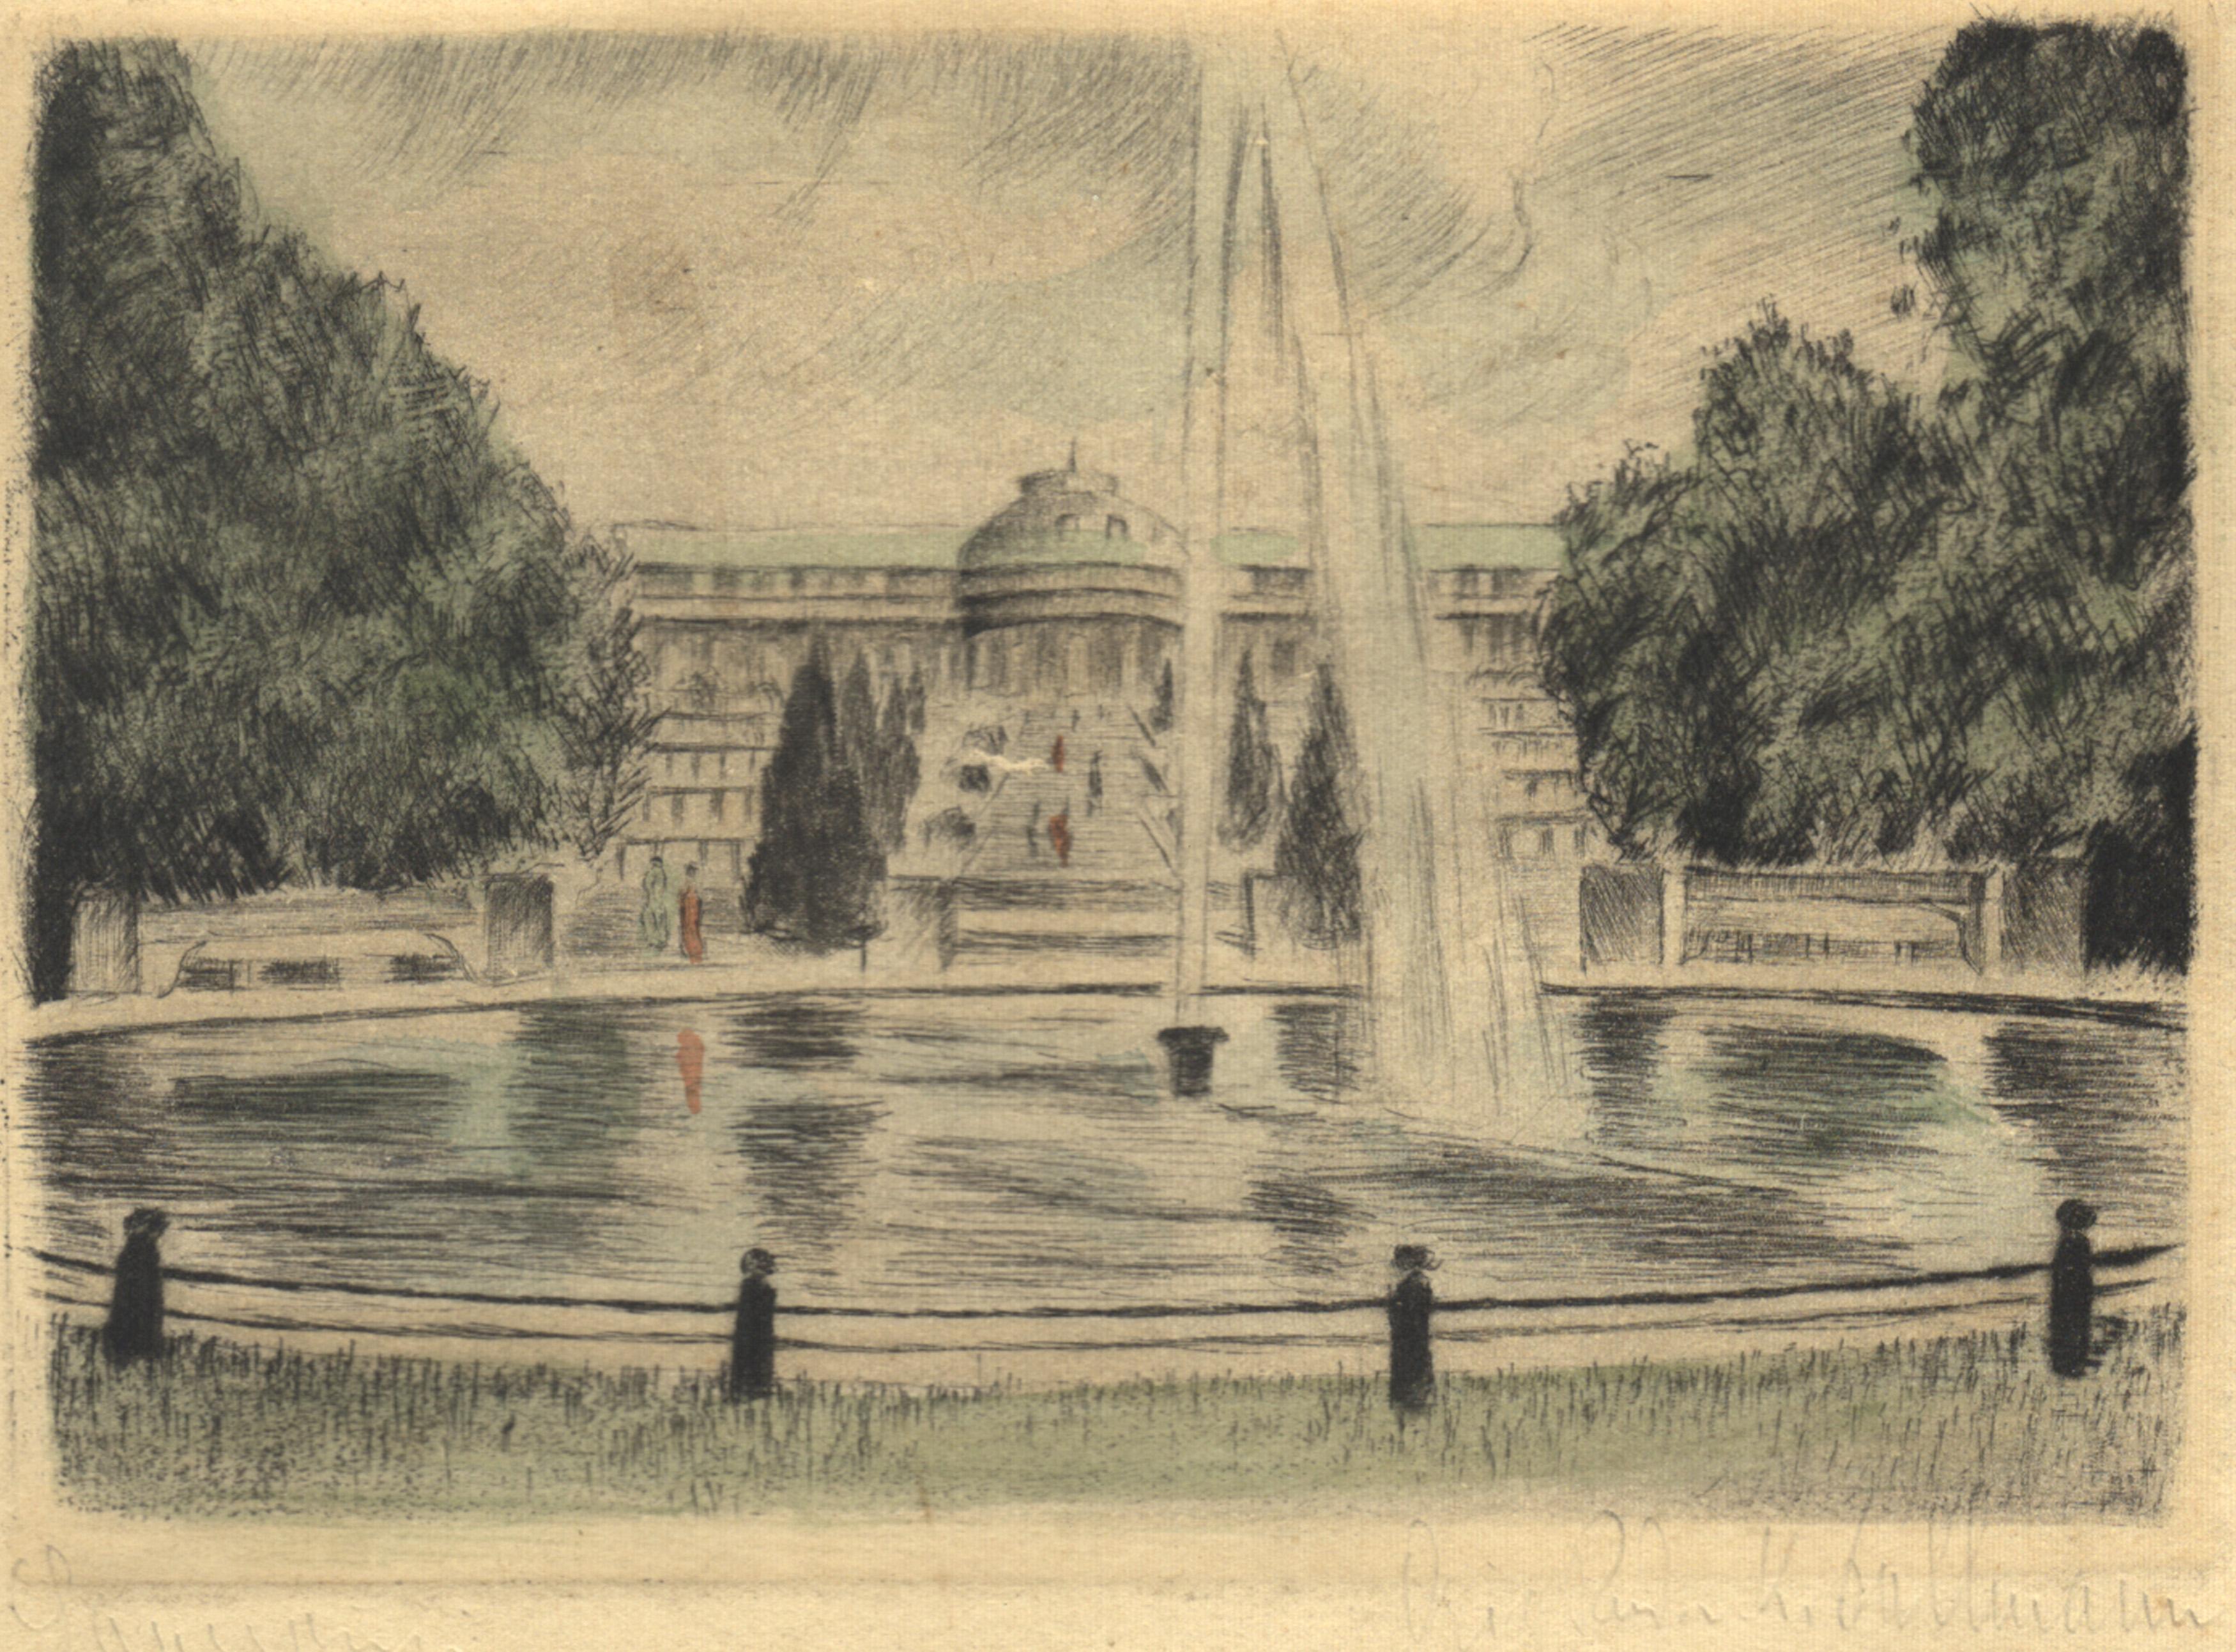 Südseite, i. Vgr. d. Fontaine zu .: Potsdam - Schloss